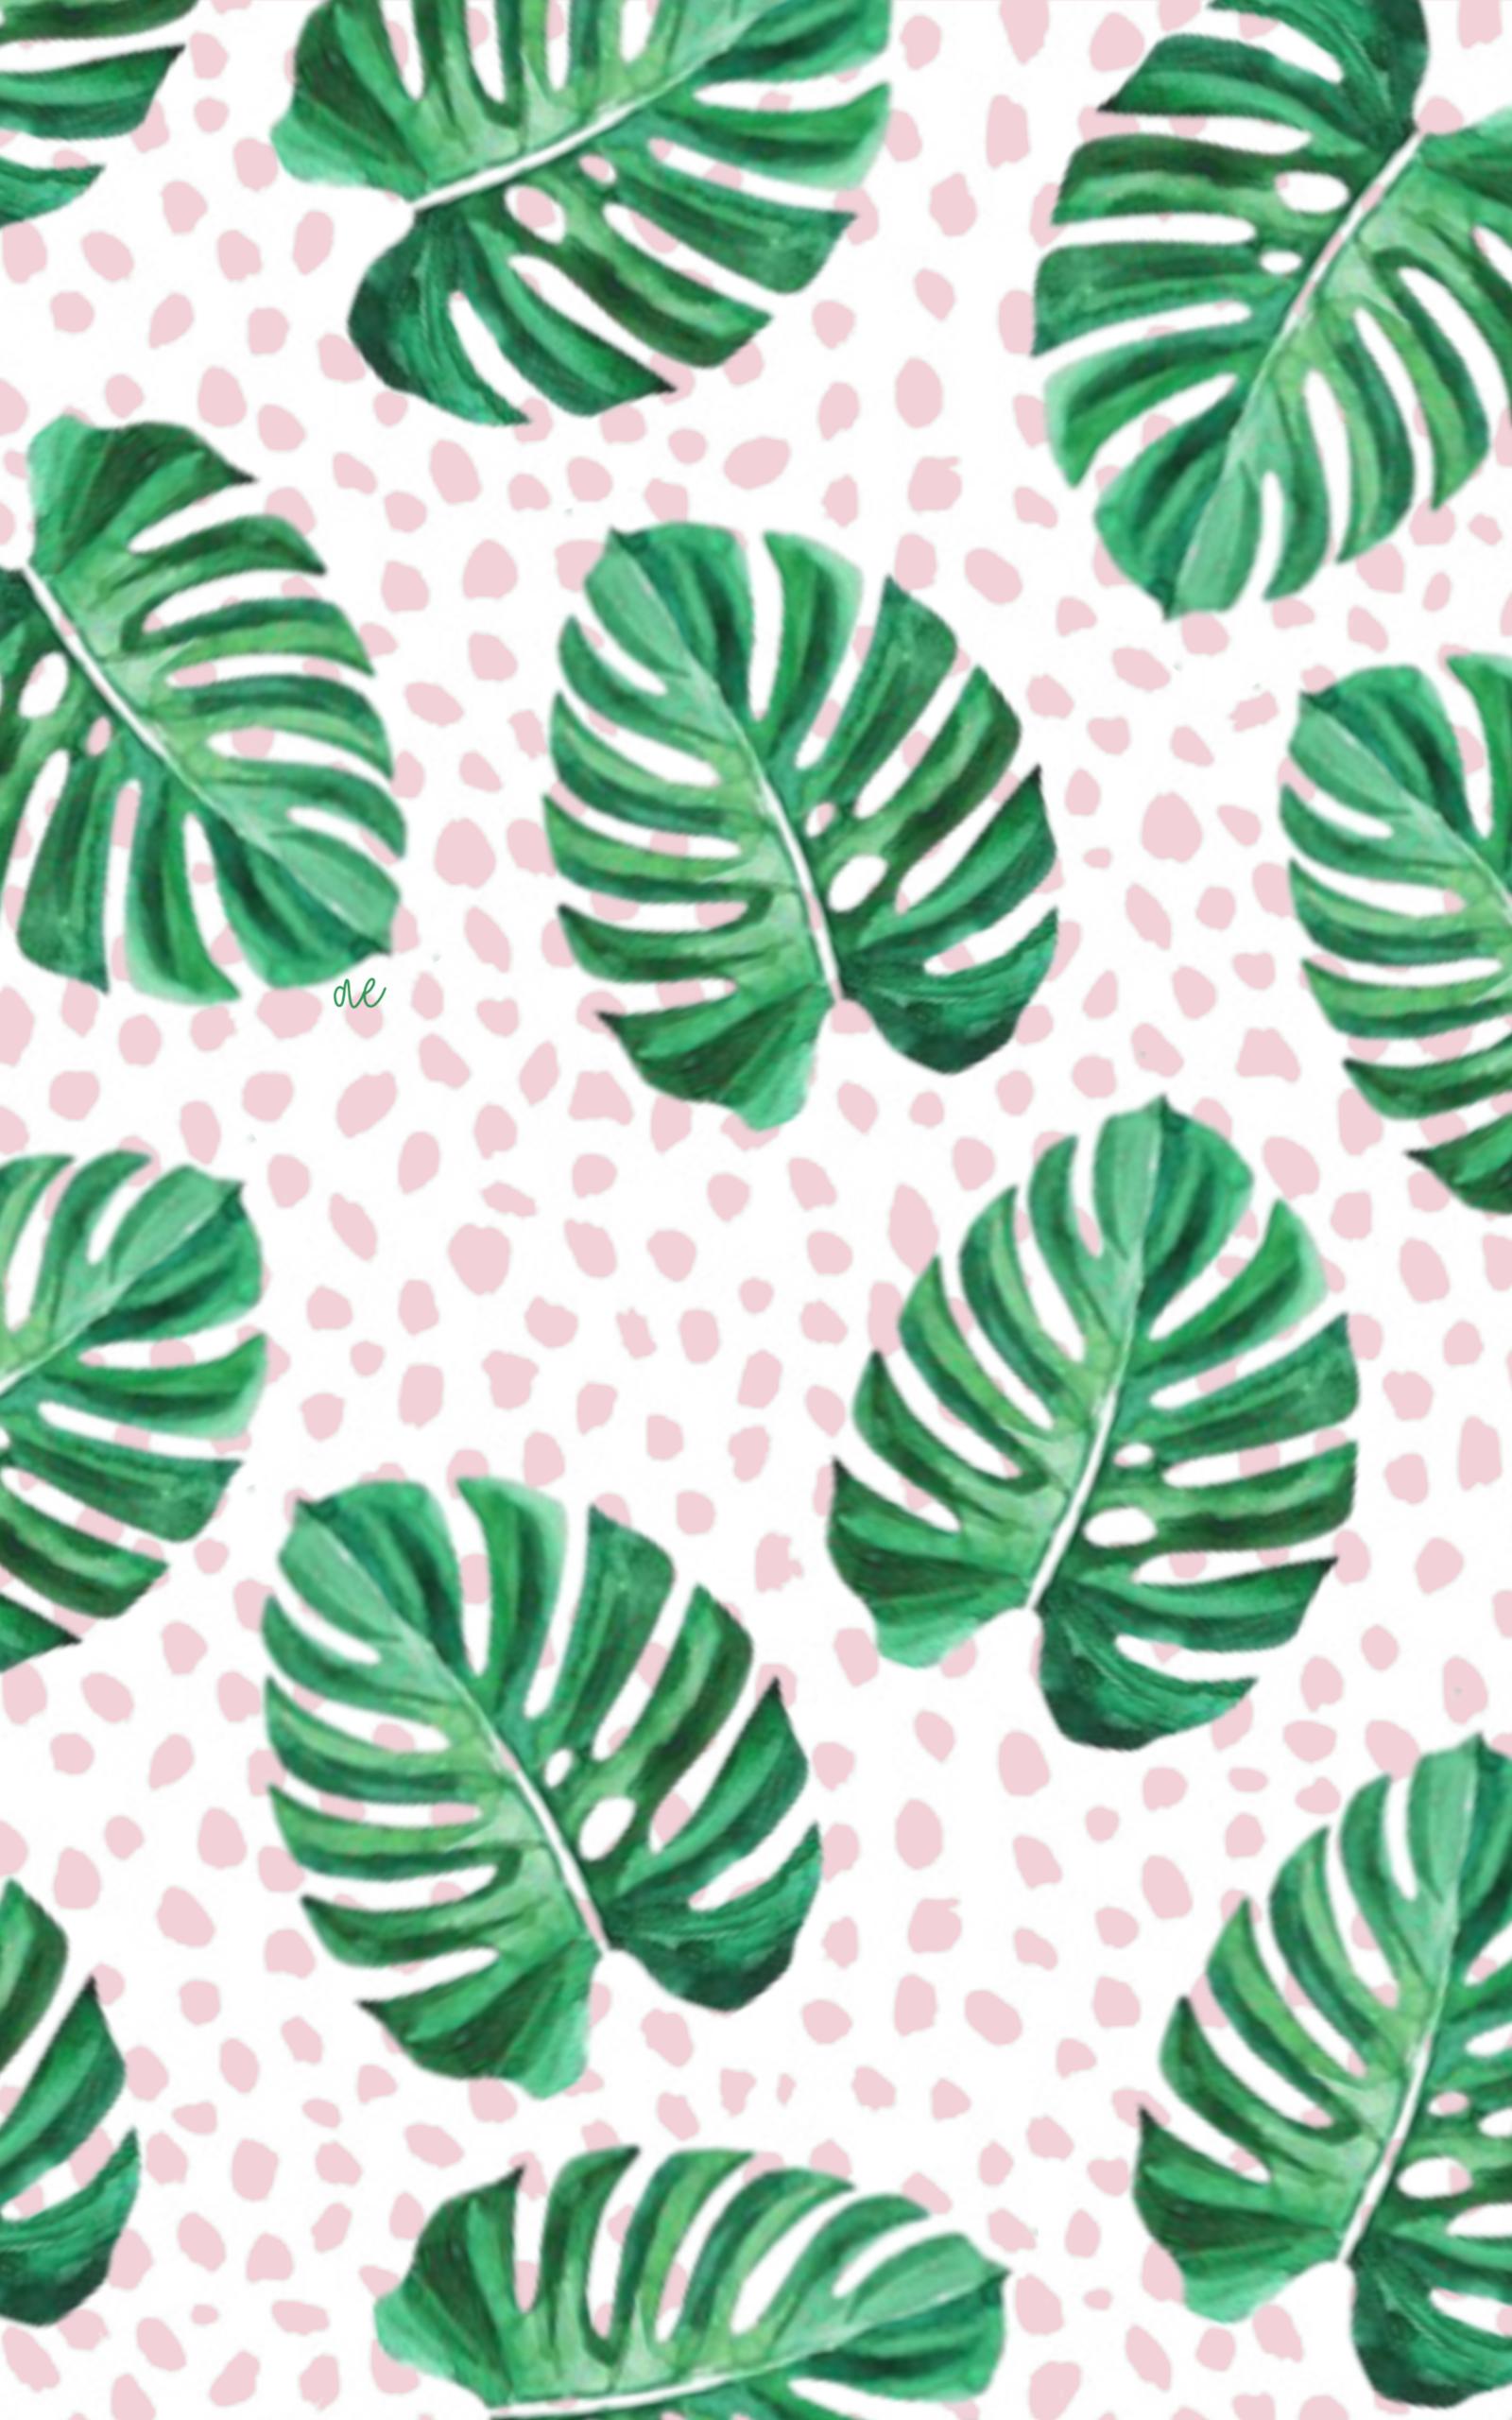 Palm Leaf Iphone Wallpaper Iphone Wallpaper Girly Iphone Background Wallpaper Iphone Wallpaper